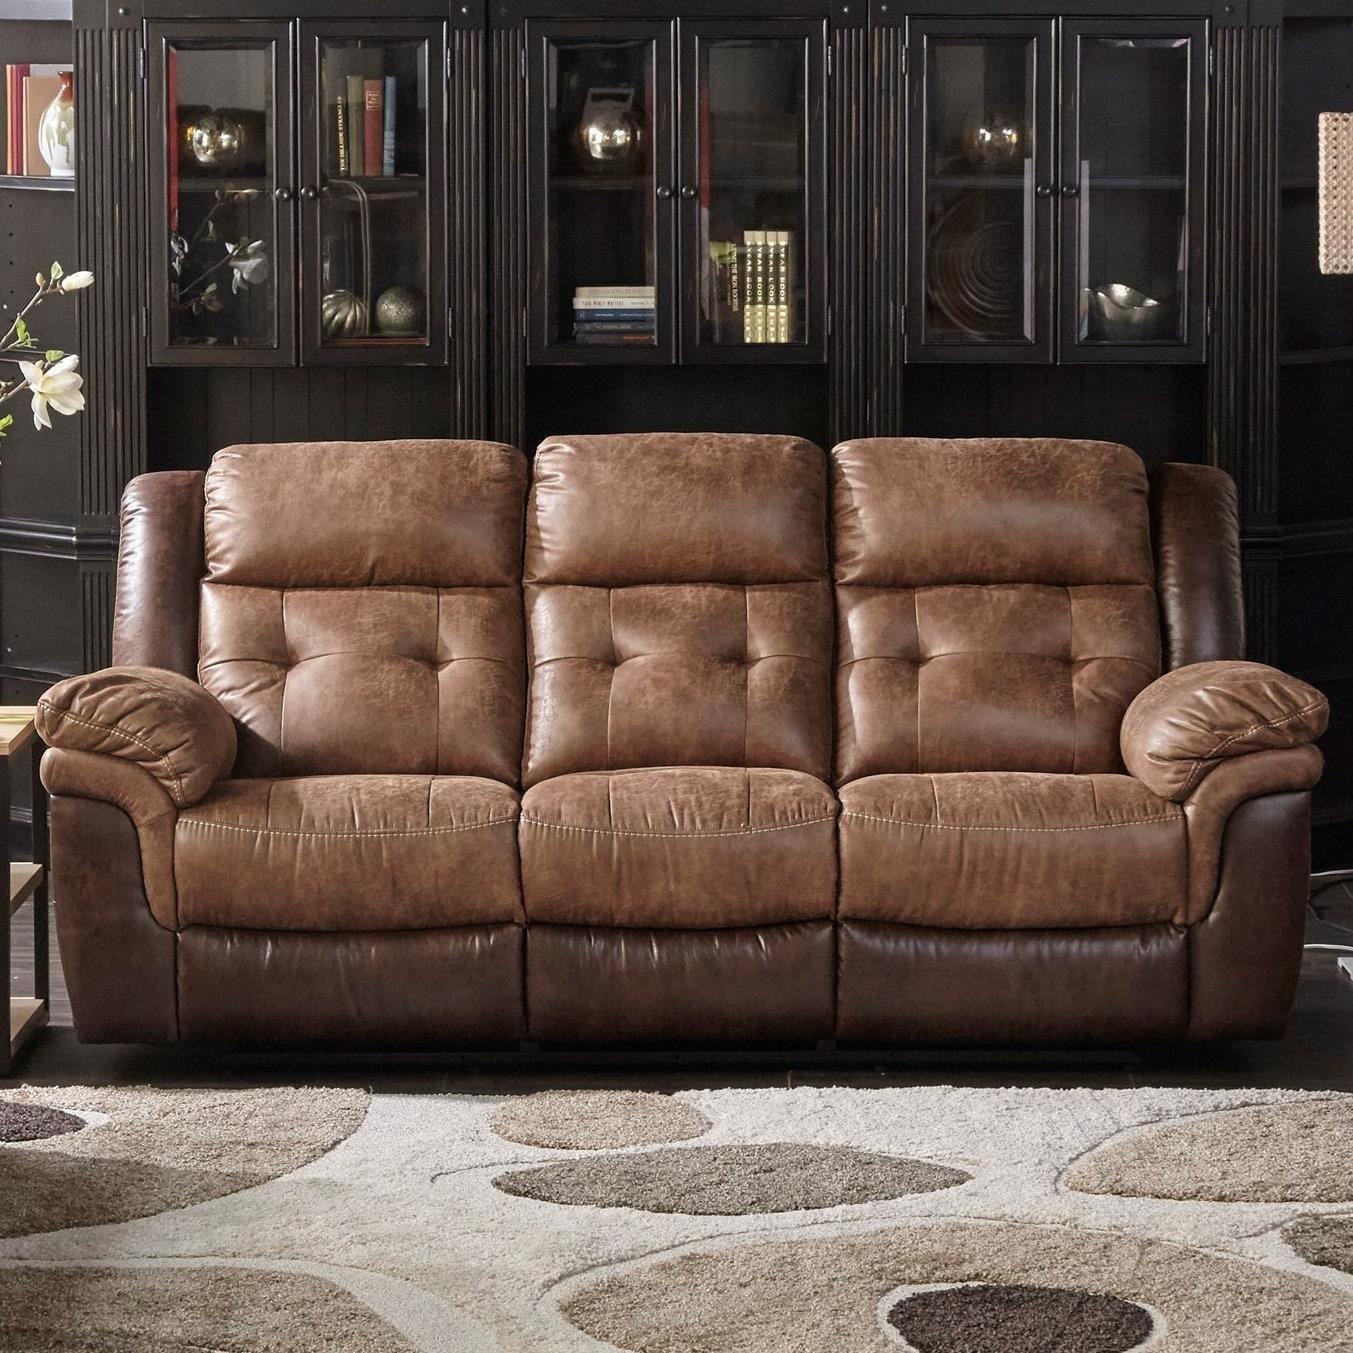 Cheers Sofa Houston CHEE XW5156ML3 2M3182731828 Dual